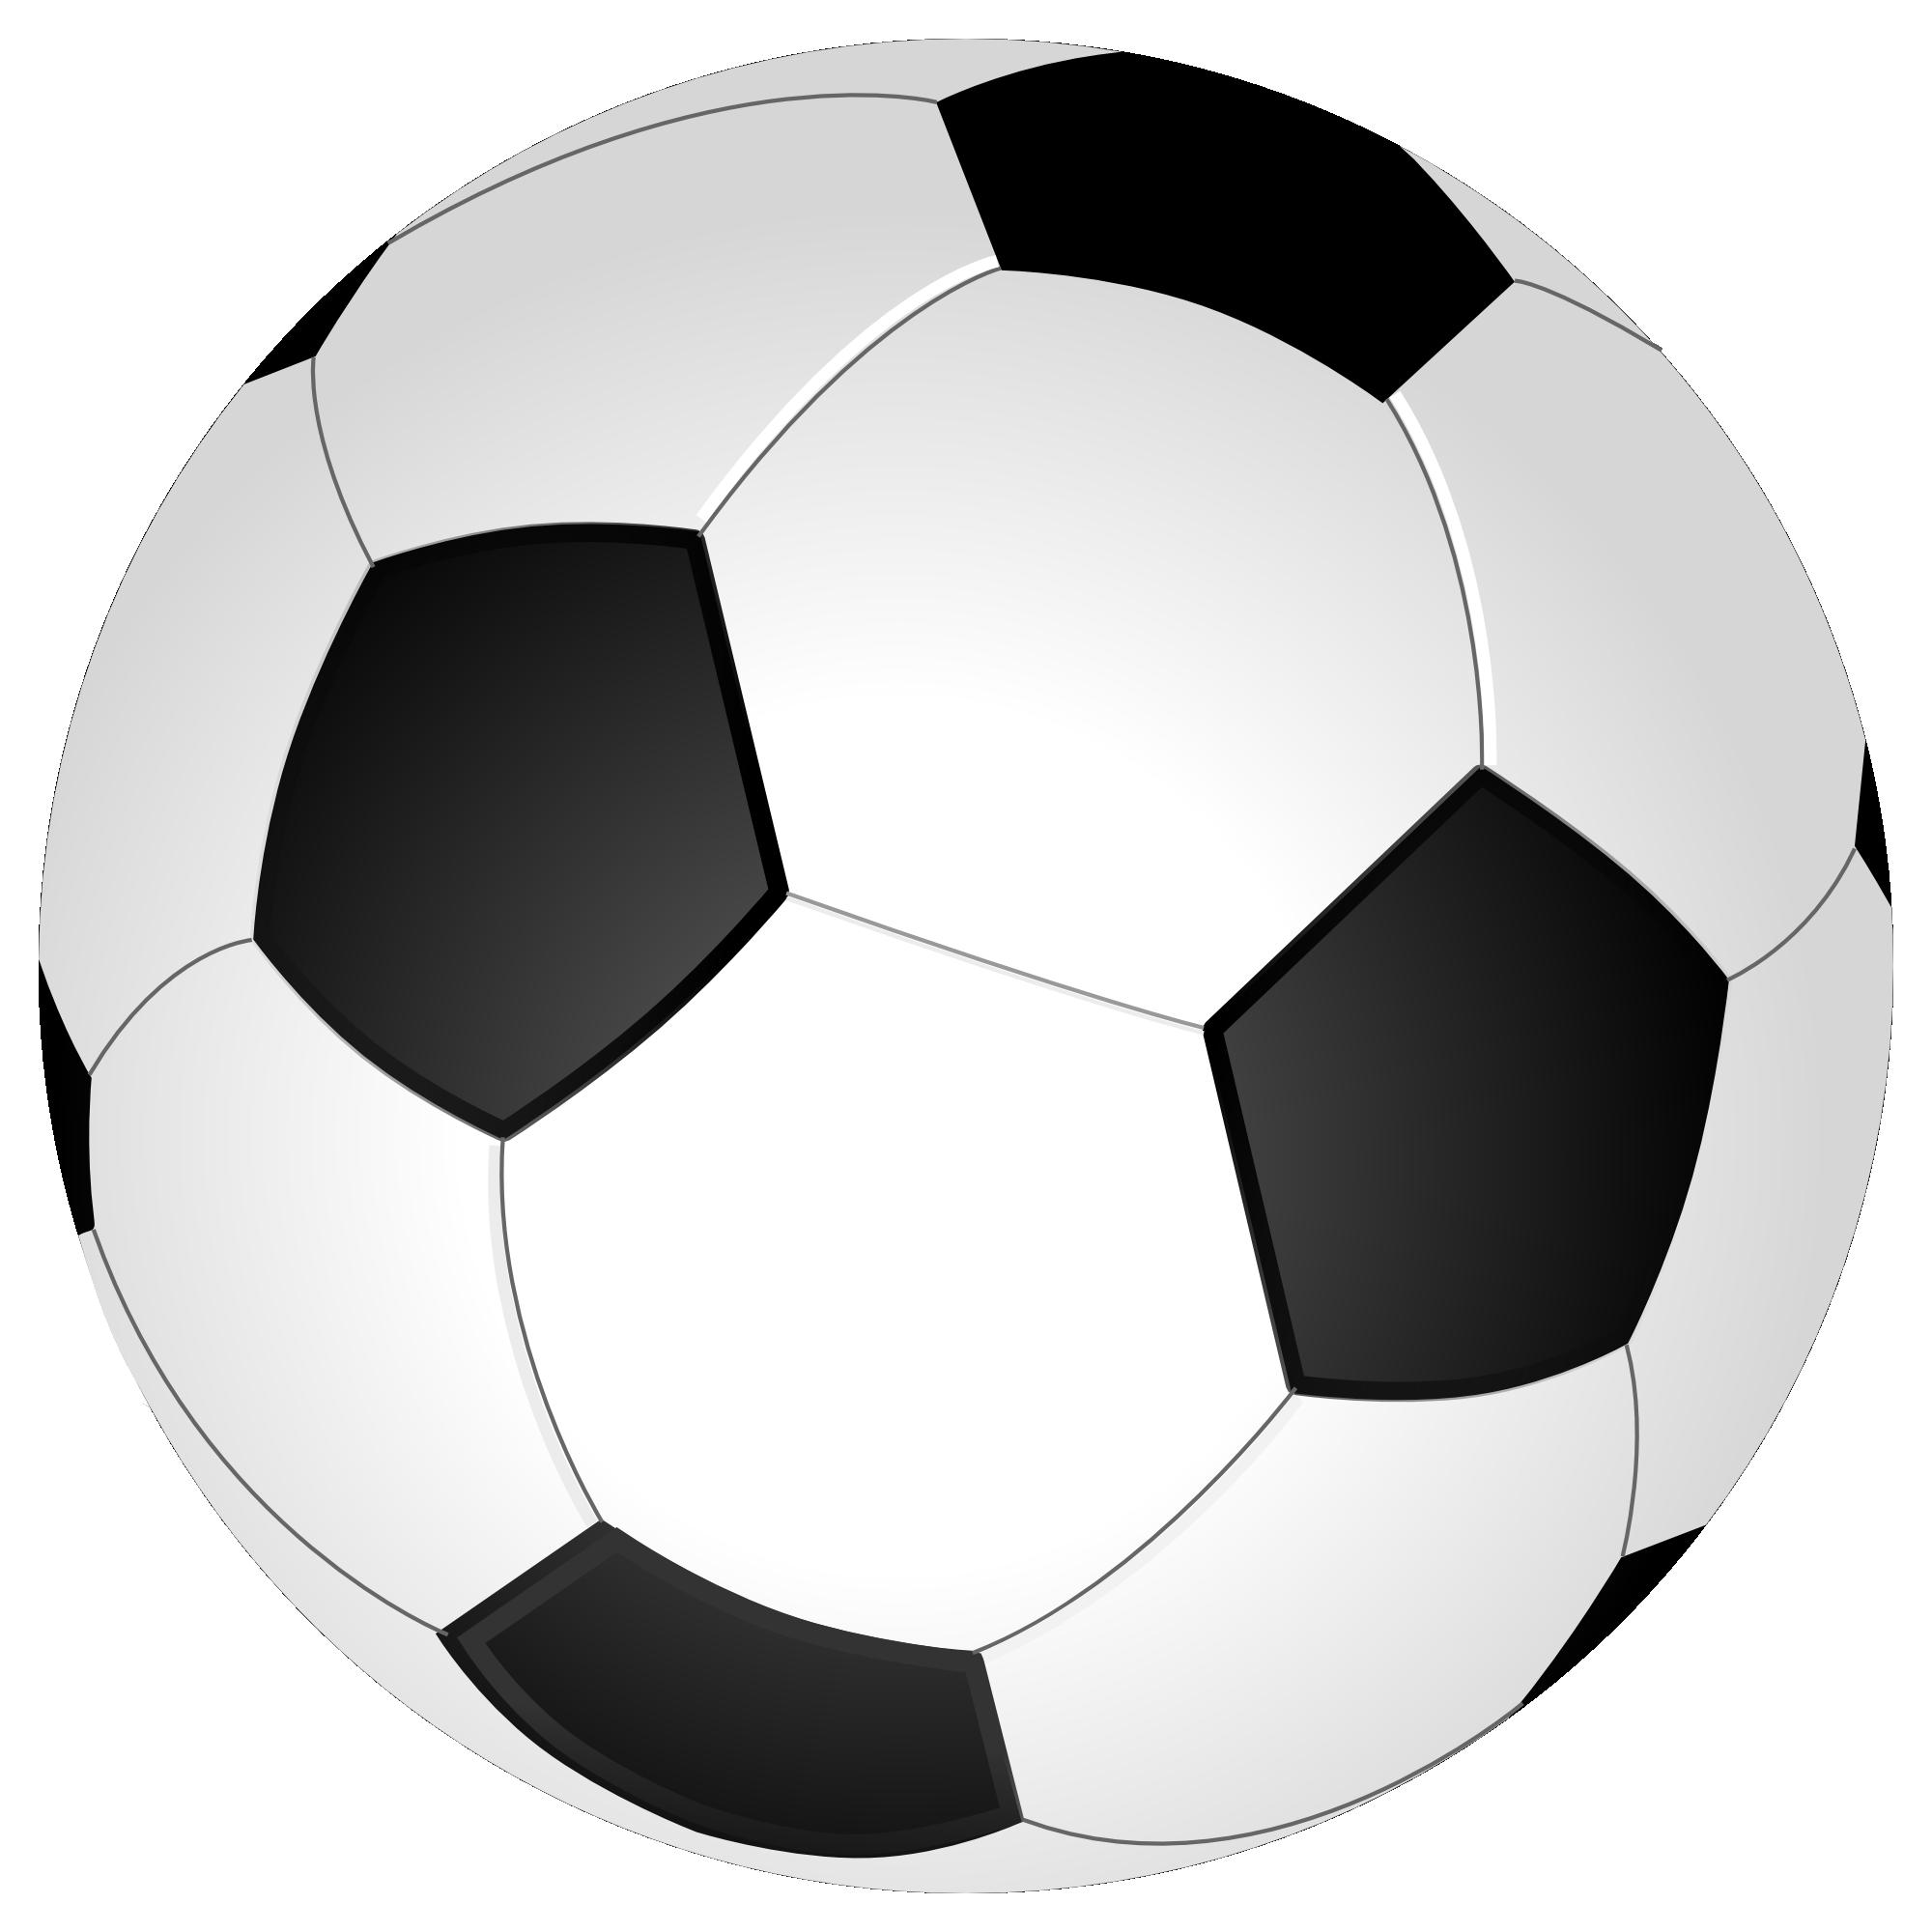 2000x2000 Football Vector Png Transparent Image